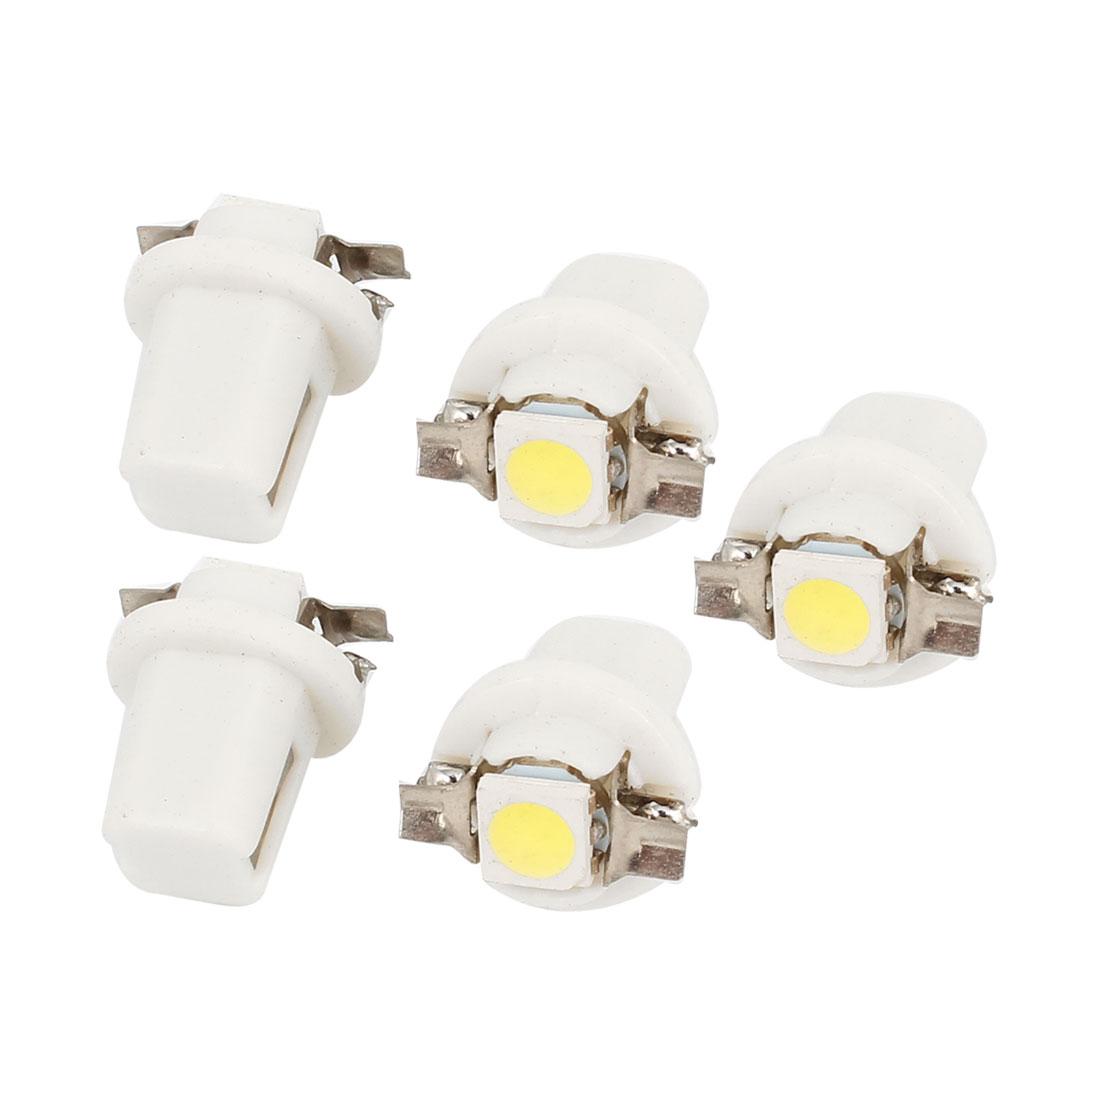 Car T5 B8.5D 5050 SMD LED Light Bulb Dashboard Gauge Lamp White 5 Pcs internal